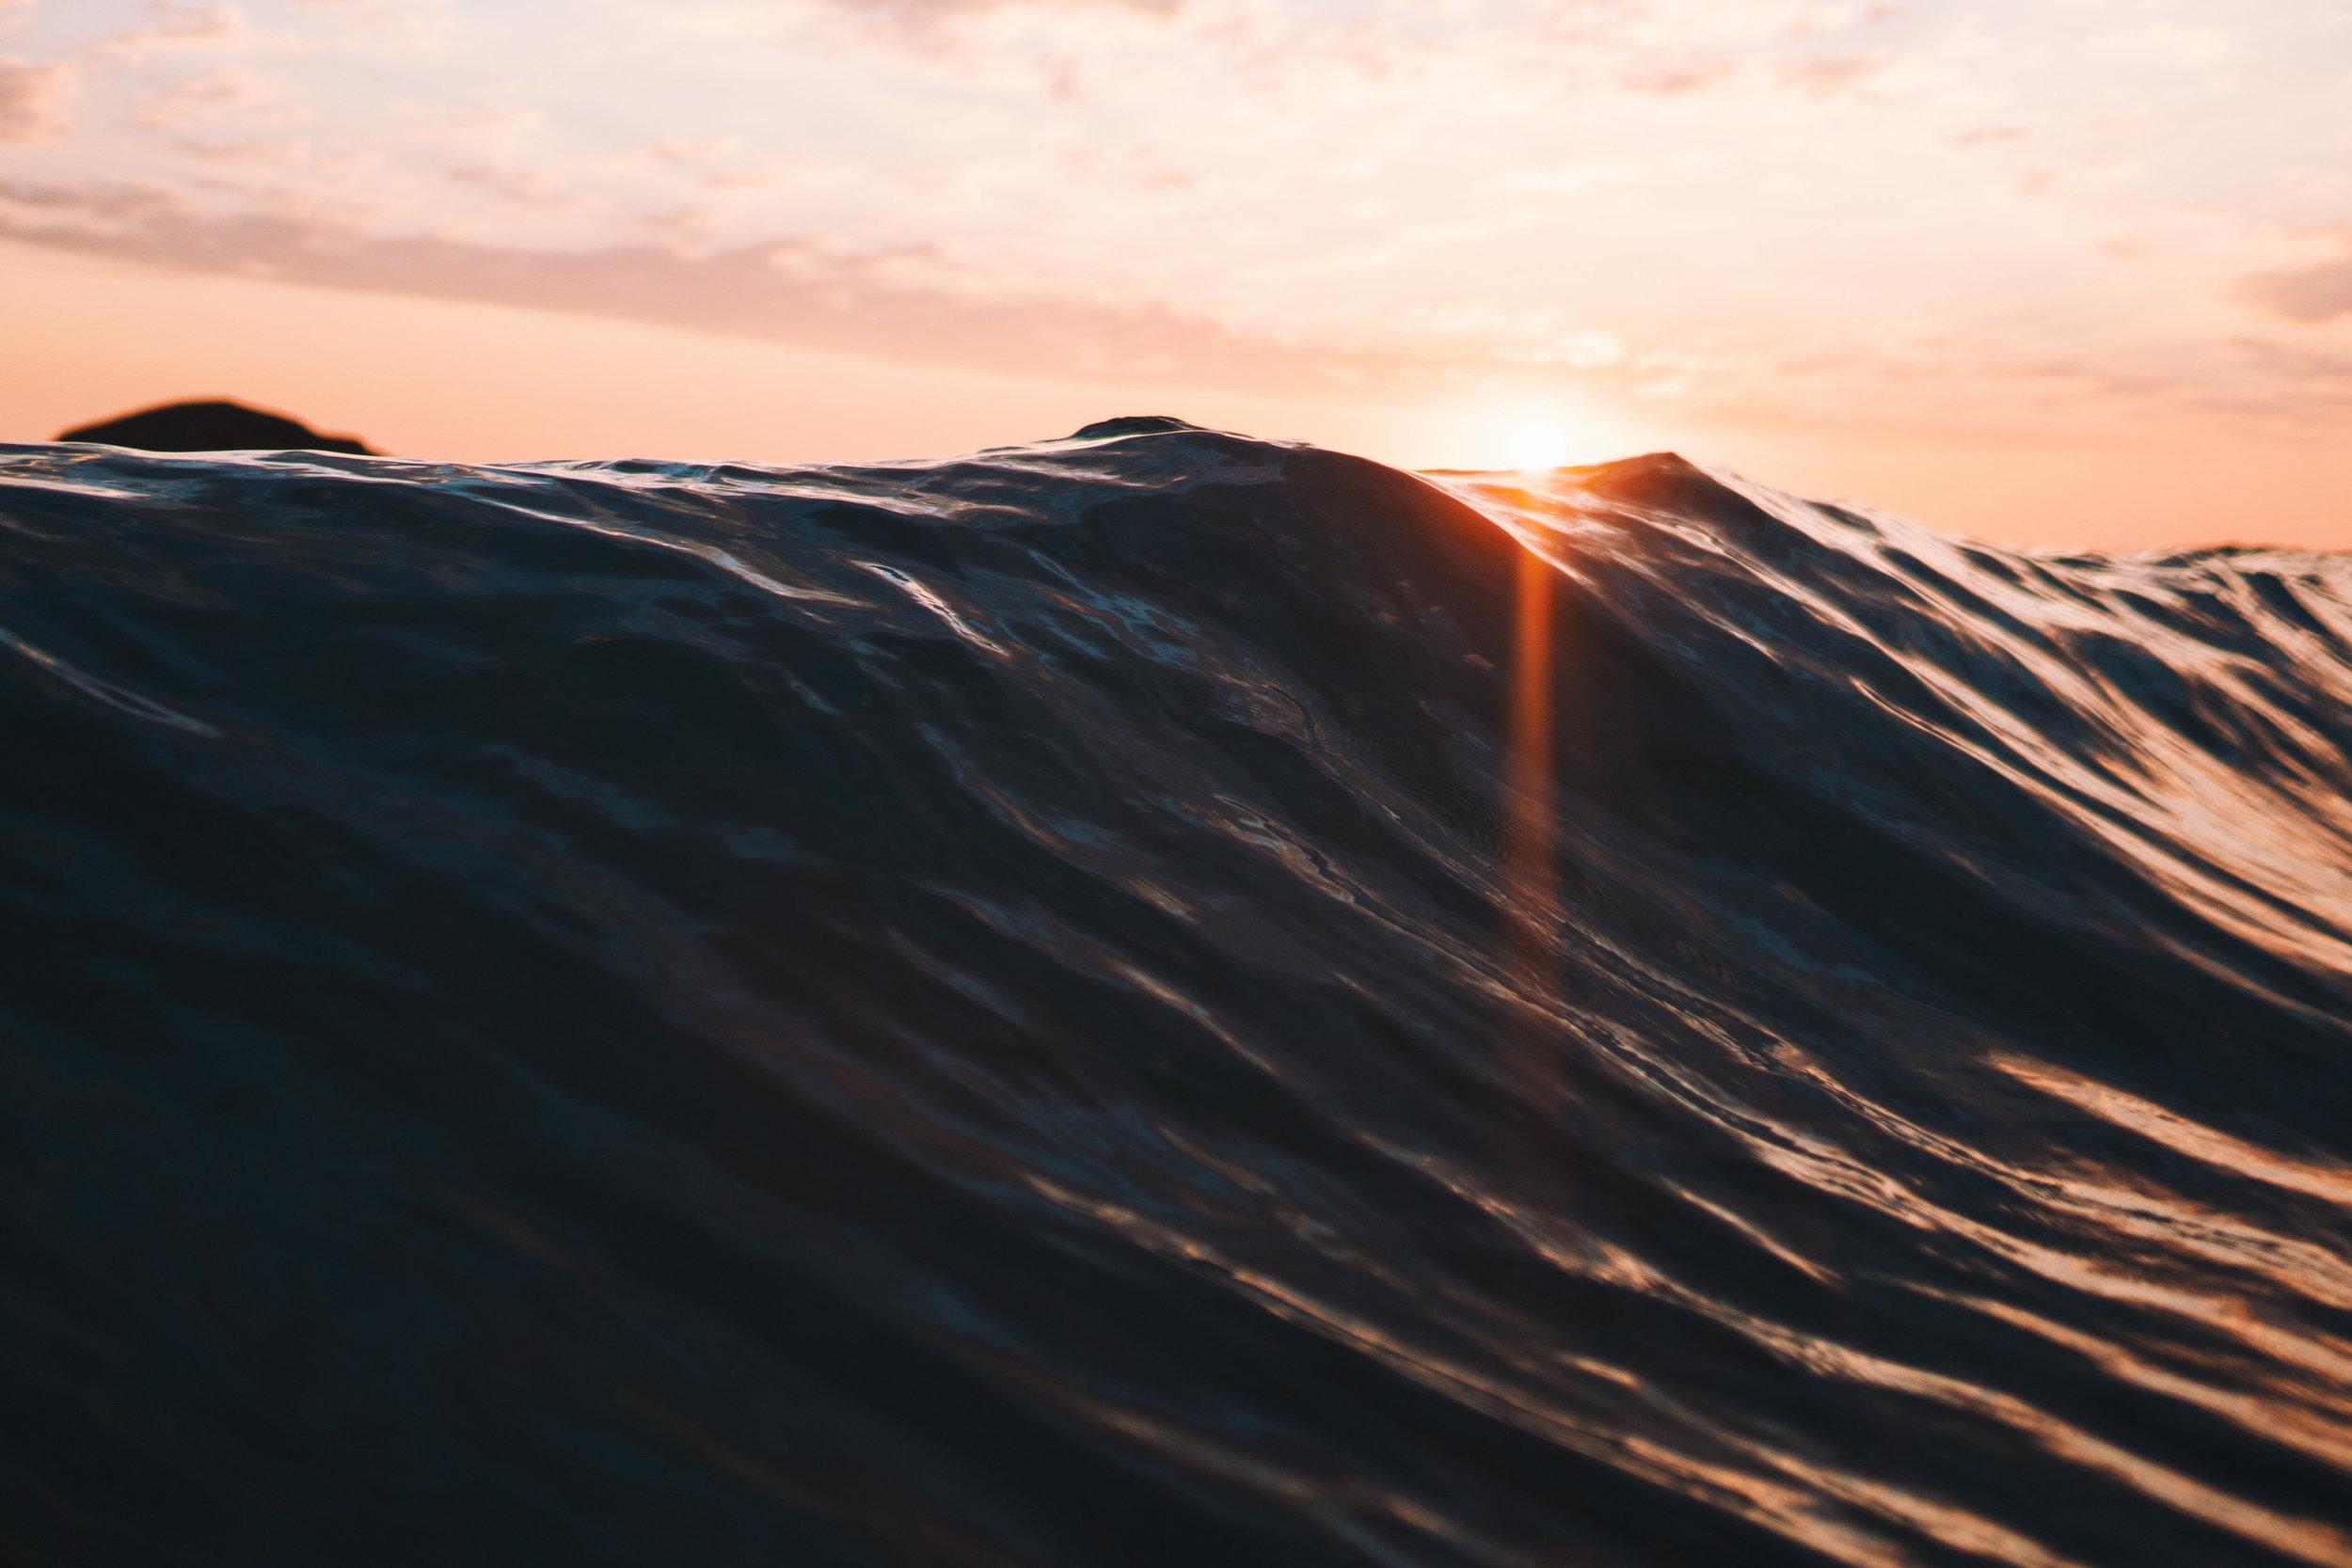 Surf-Mexico-Zihuatanejo-Sayulita-Ixtapa-Zihuatanejo-Diego-Cadena-Olas-Fotografia-Heiko-Bothe-38.jpg